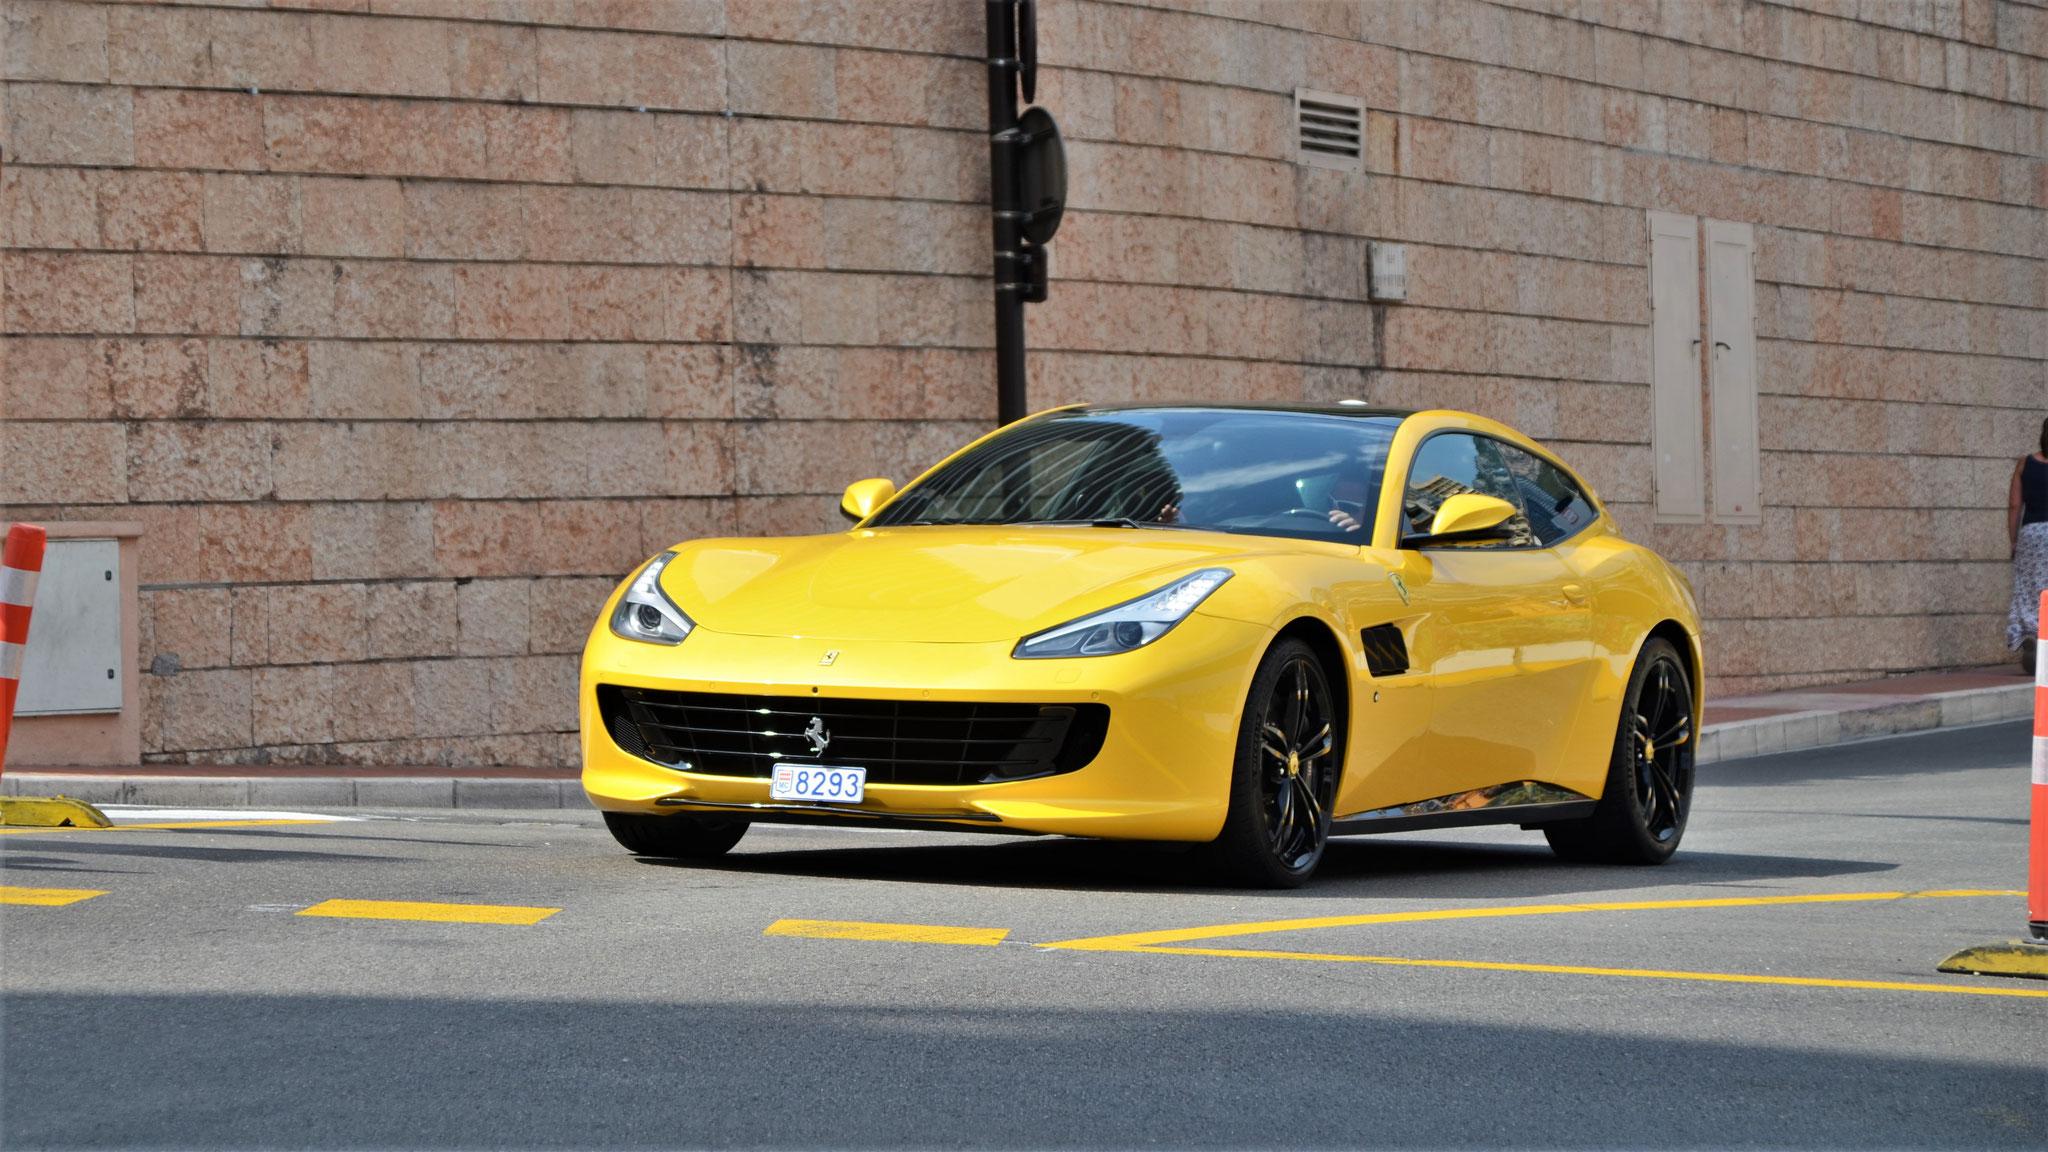 Ferrari GTC4 Lusso - 8293 (MC)